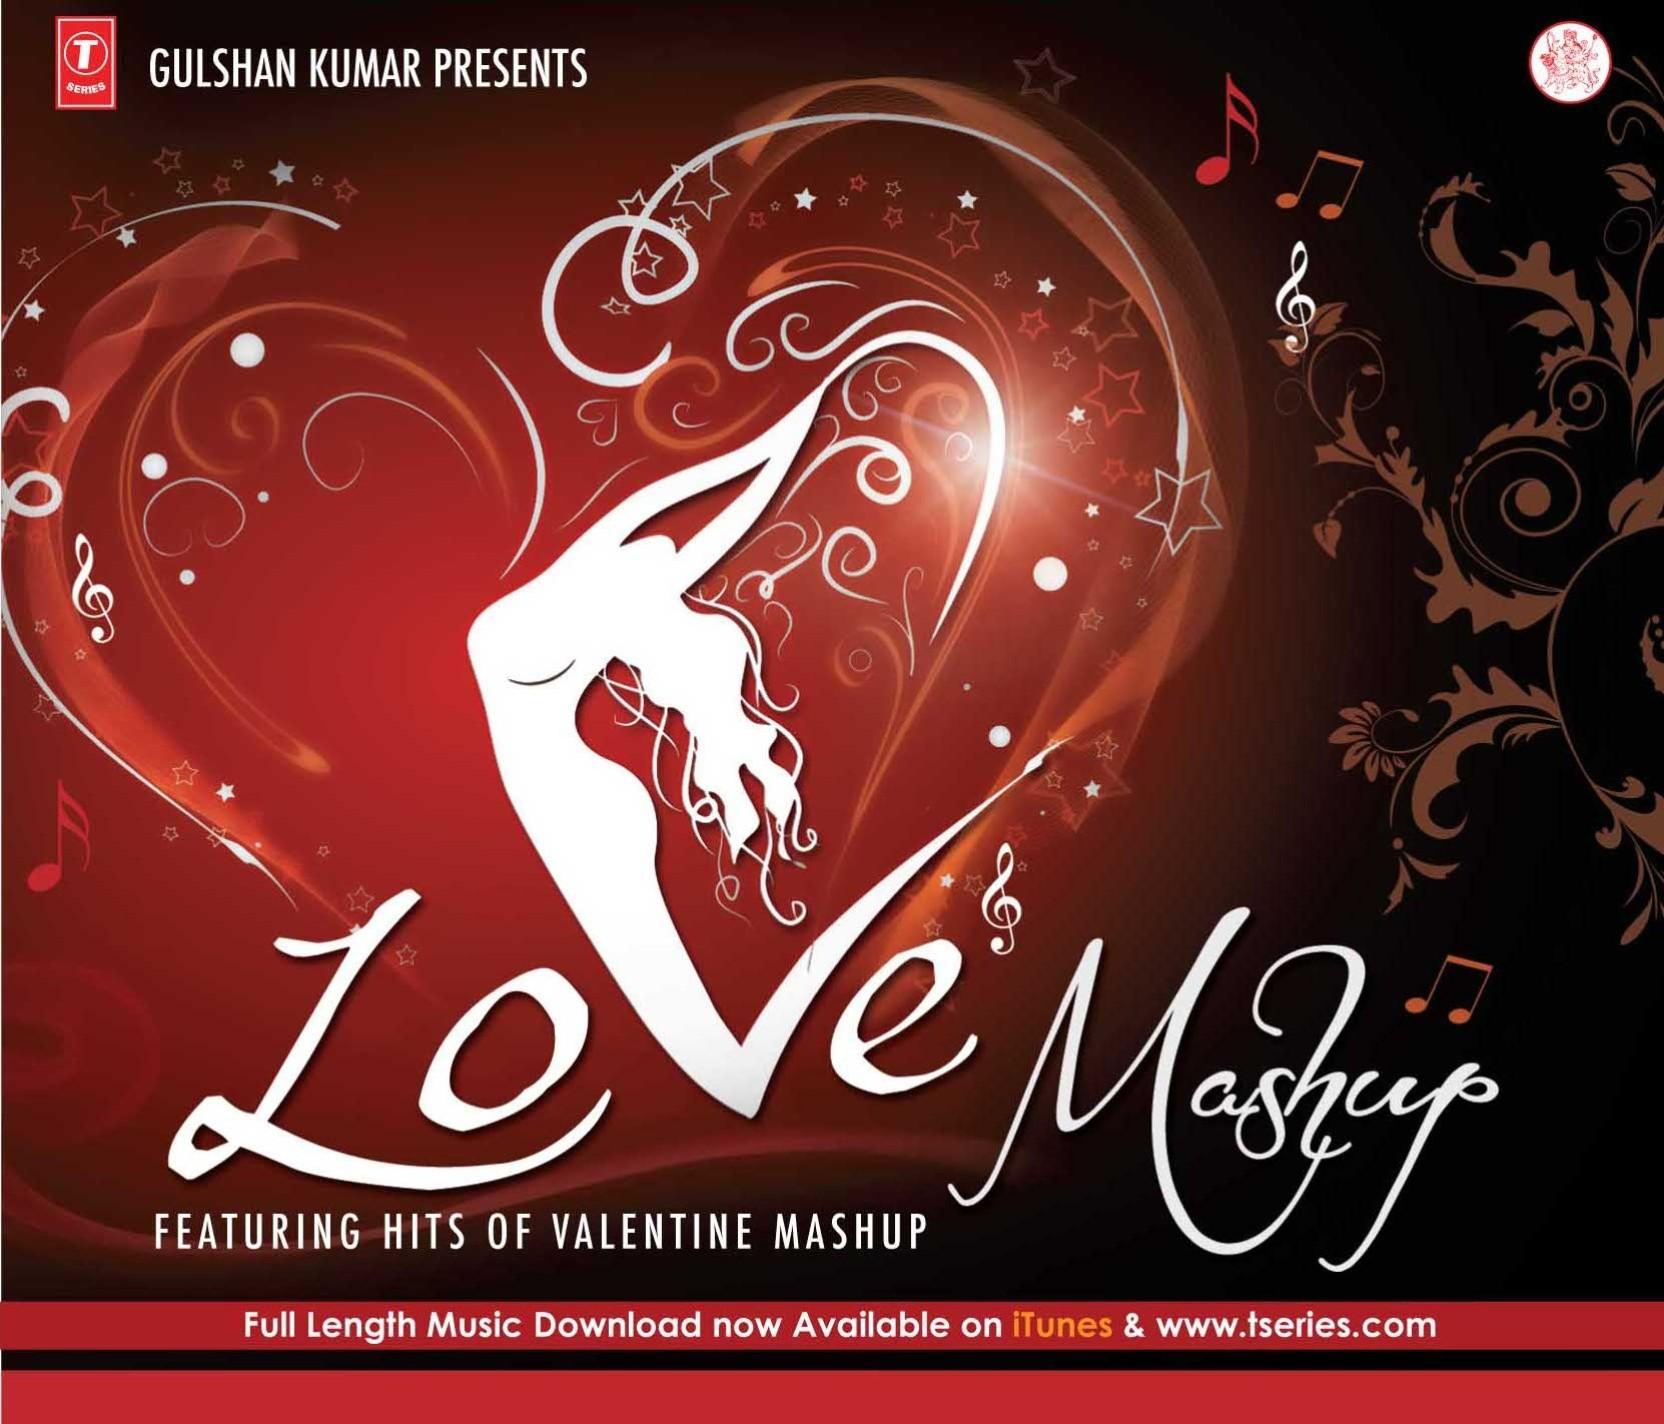 Love Mashup Songs Download: Love Mashup Music Audio CD